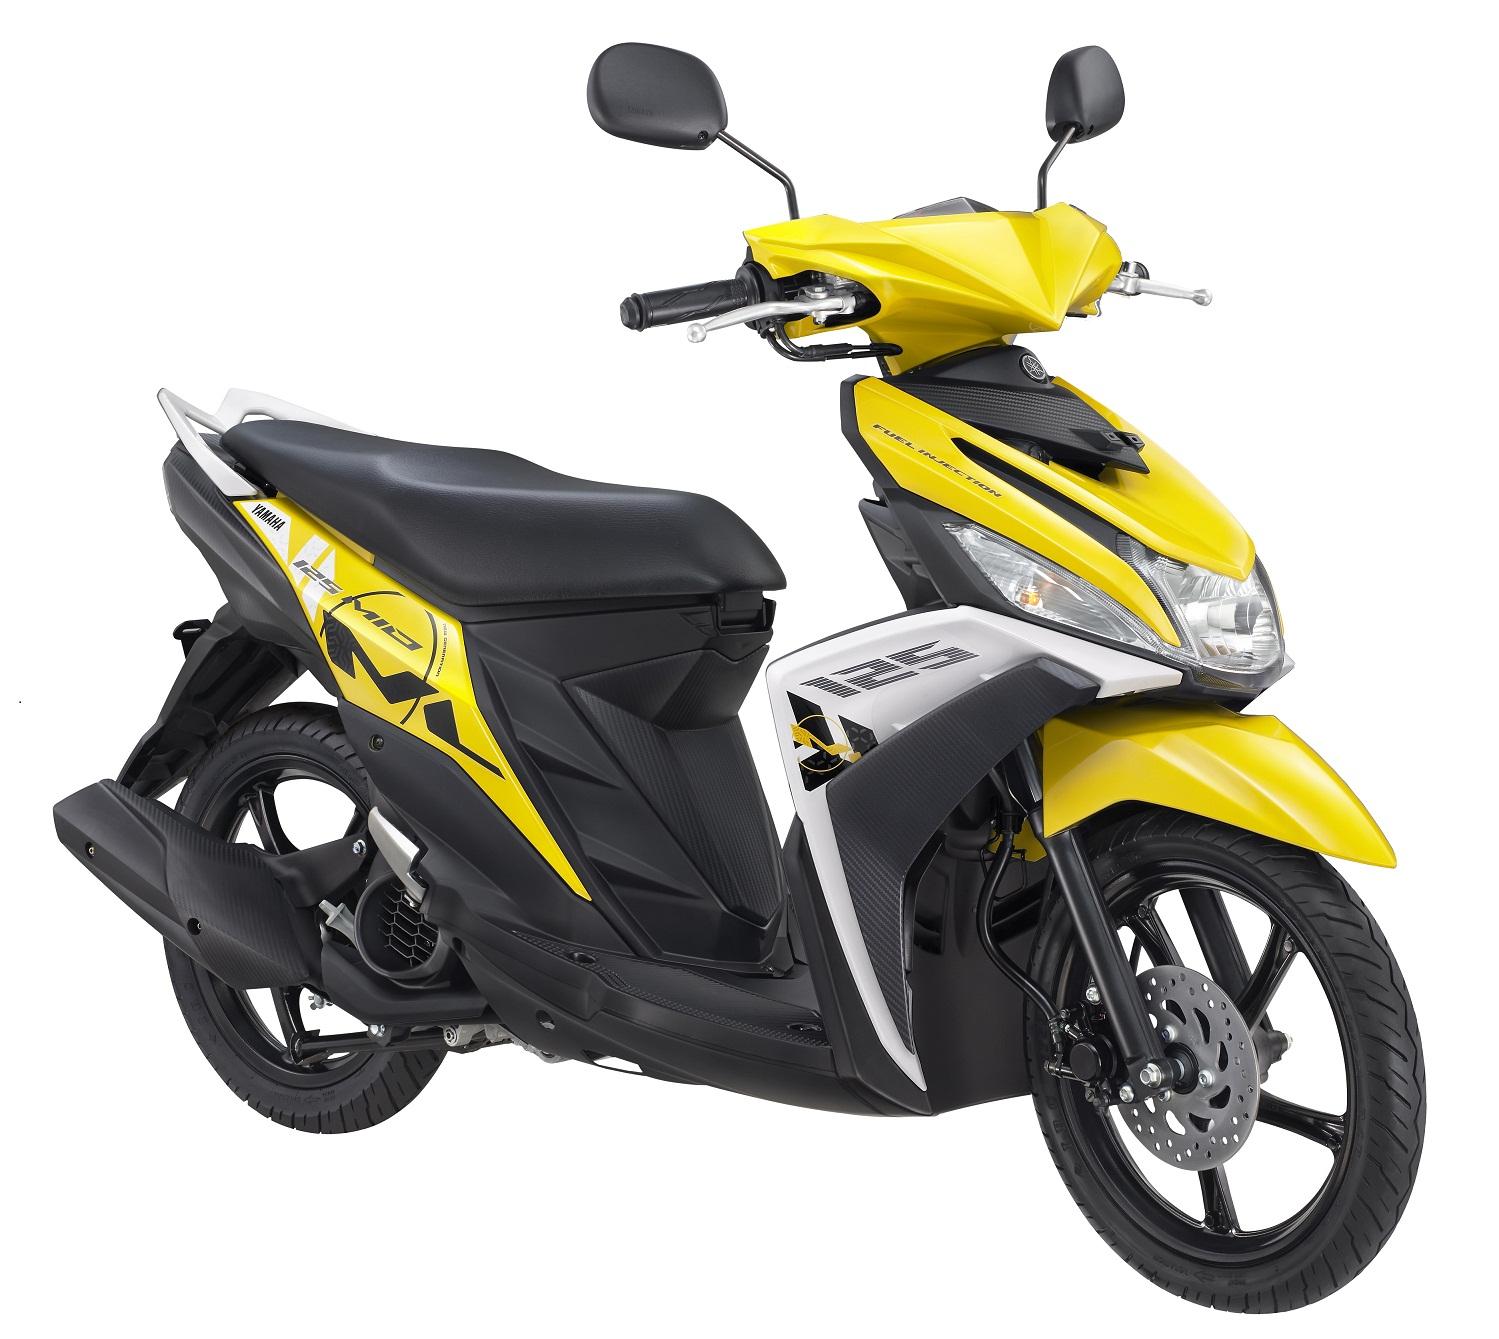 100 Gambar Motor Matic Yamaha Tahun 2015 Terbaru Gubuk Modifikasi